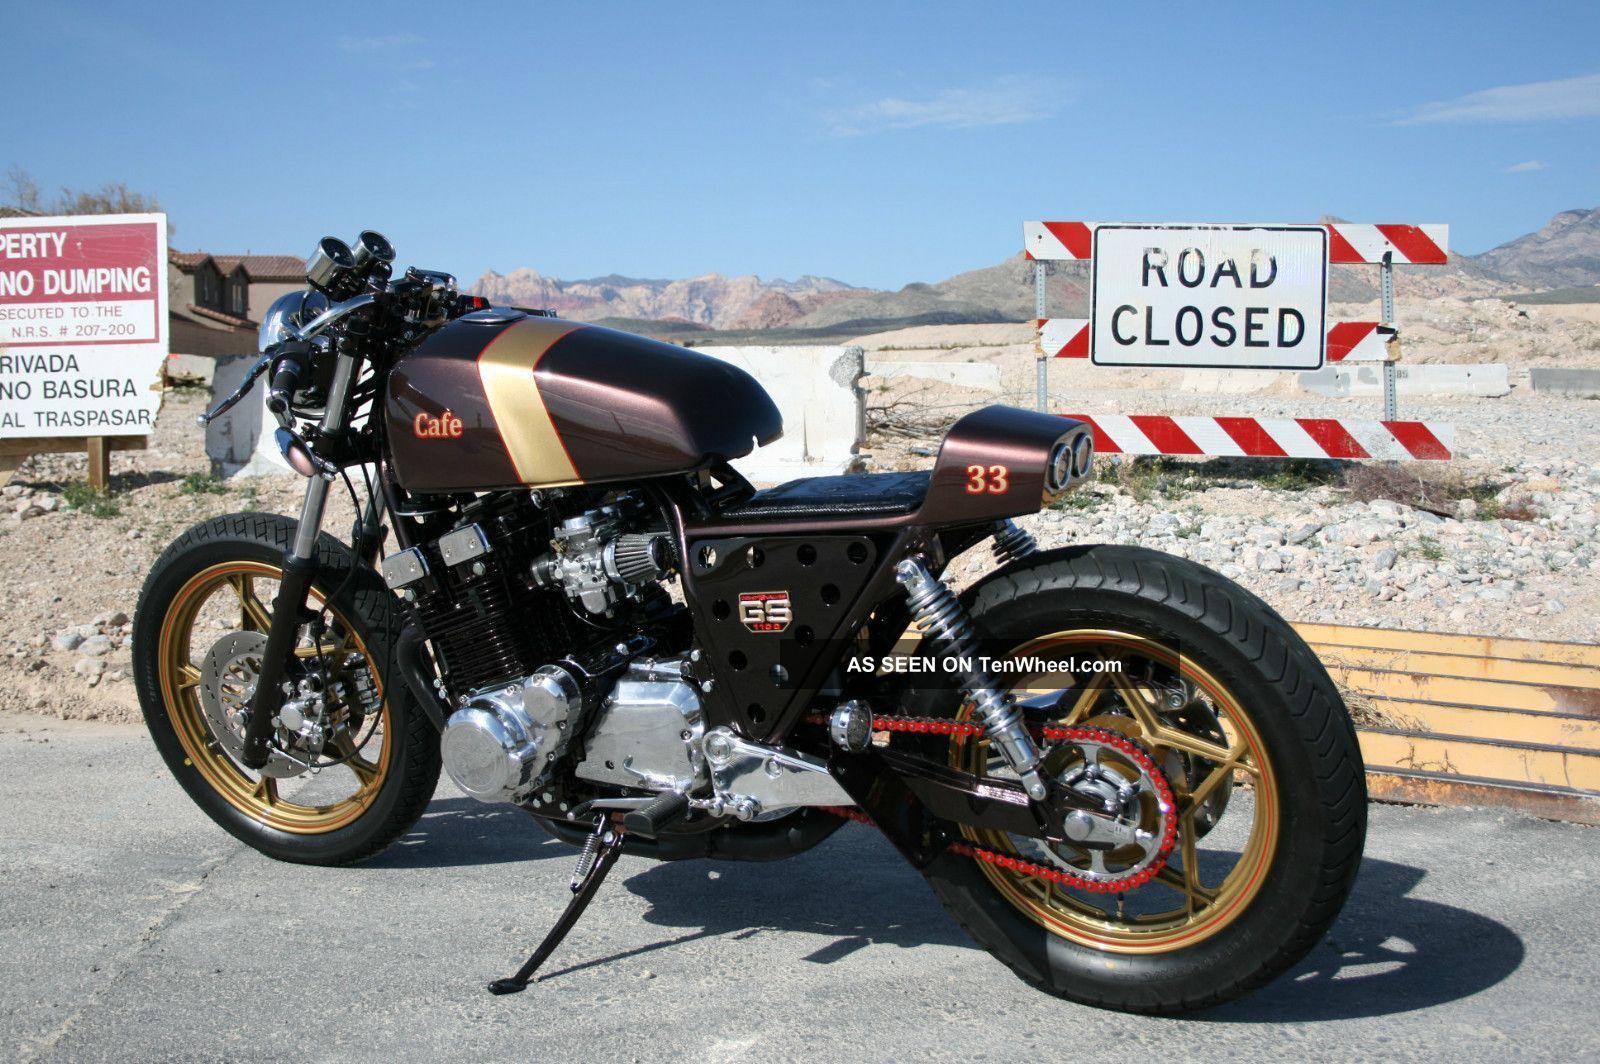 1981 gs1100 cafe racer | custom cafe racer motorcycle - 1981